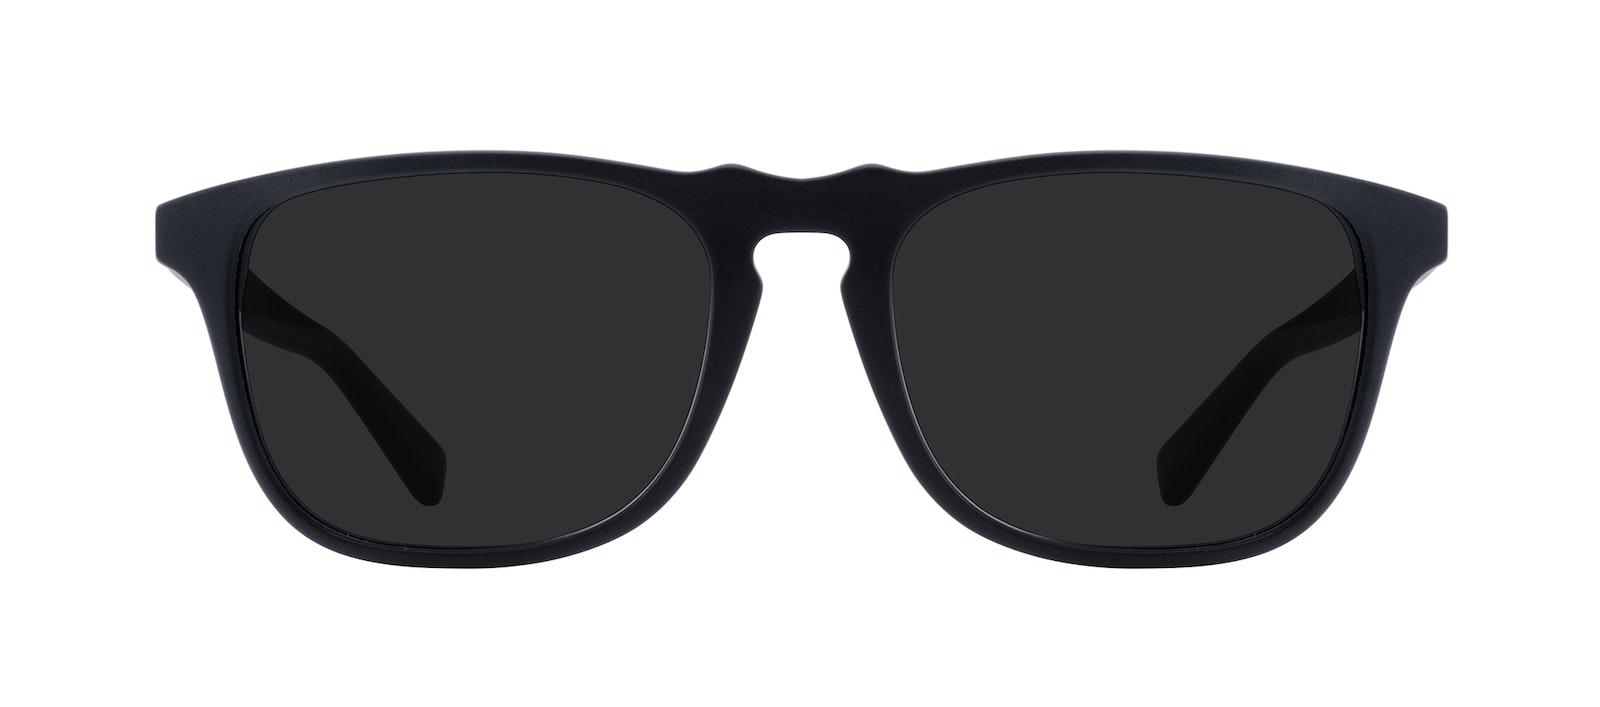 Affordable Fashion Glasses Rectangle Sunglasses Men Dare Matte Black Front